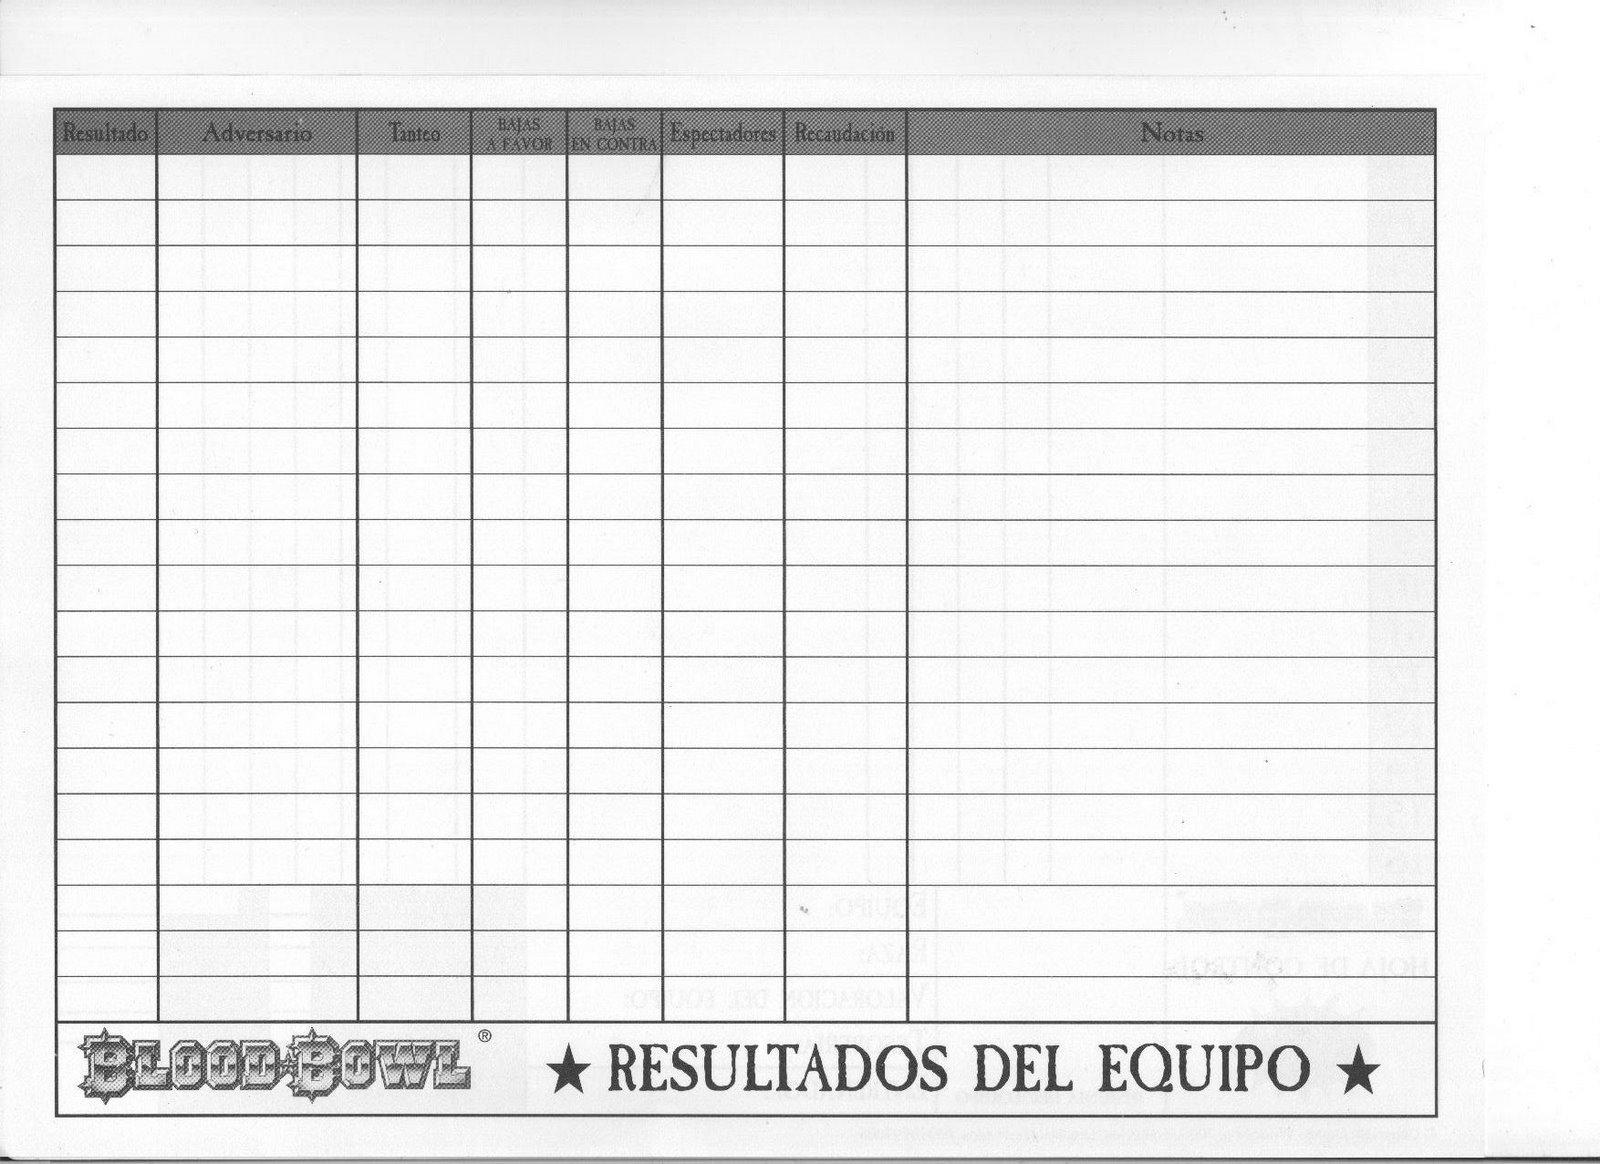 Liga Blud Boul: Hoja De Equipo En Blanco